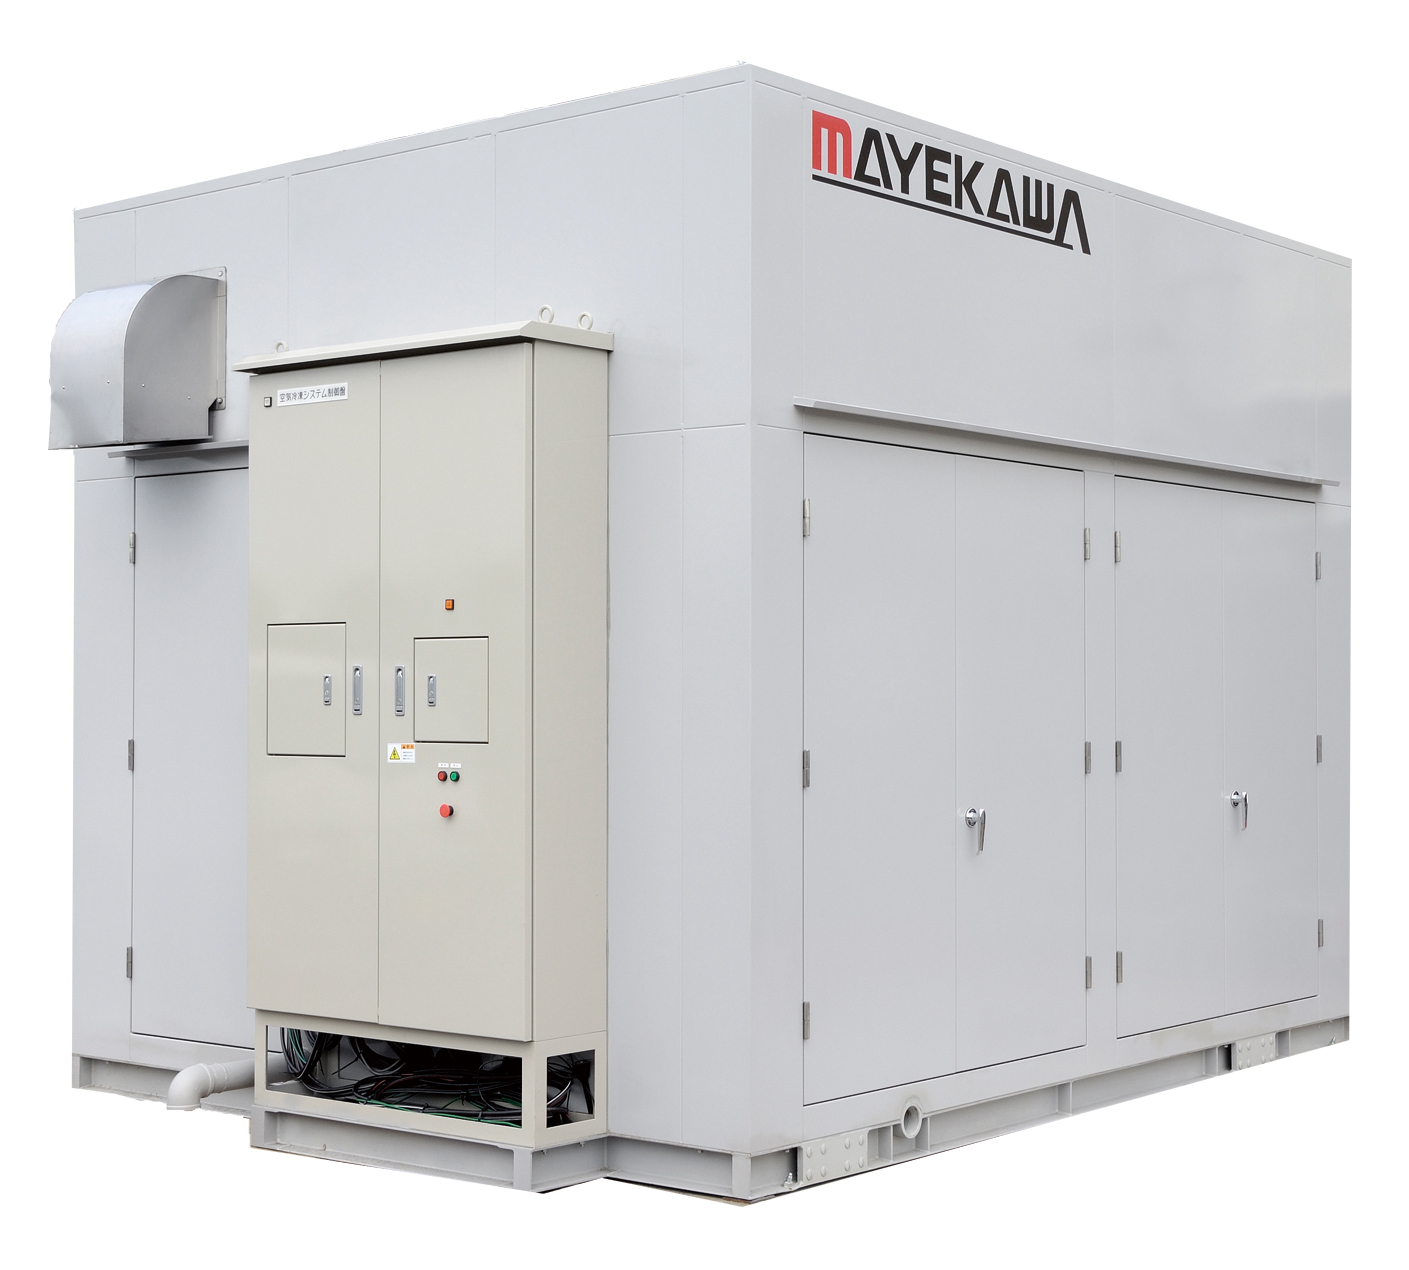 IMA Life and Mayekawa propose this new refrigeration technology referred as PascalAir